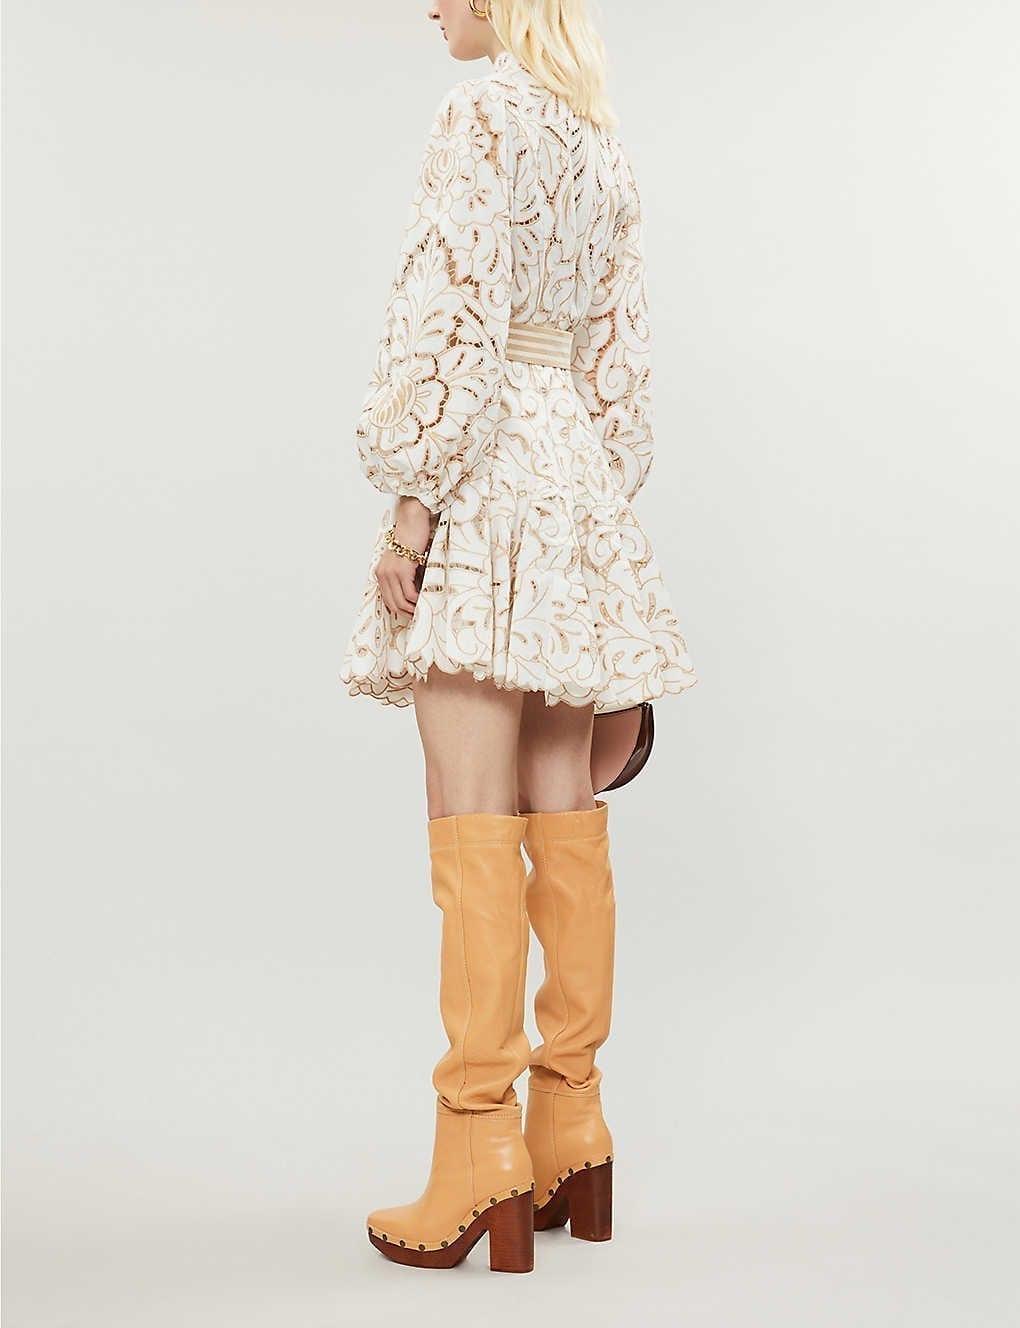 ZIMMERMANN Edie Floral Lace Mini Dress